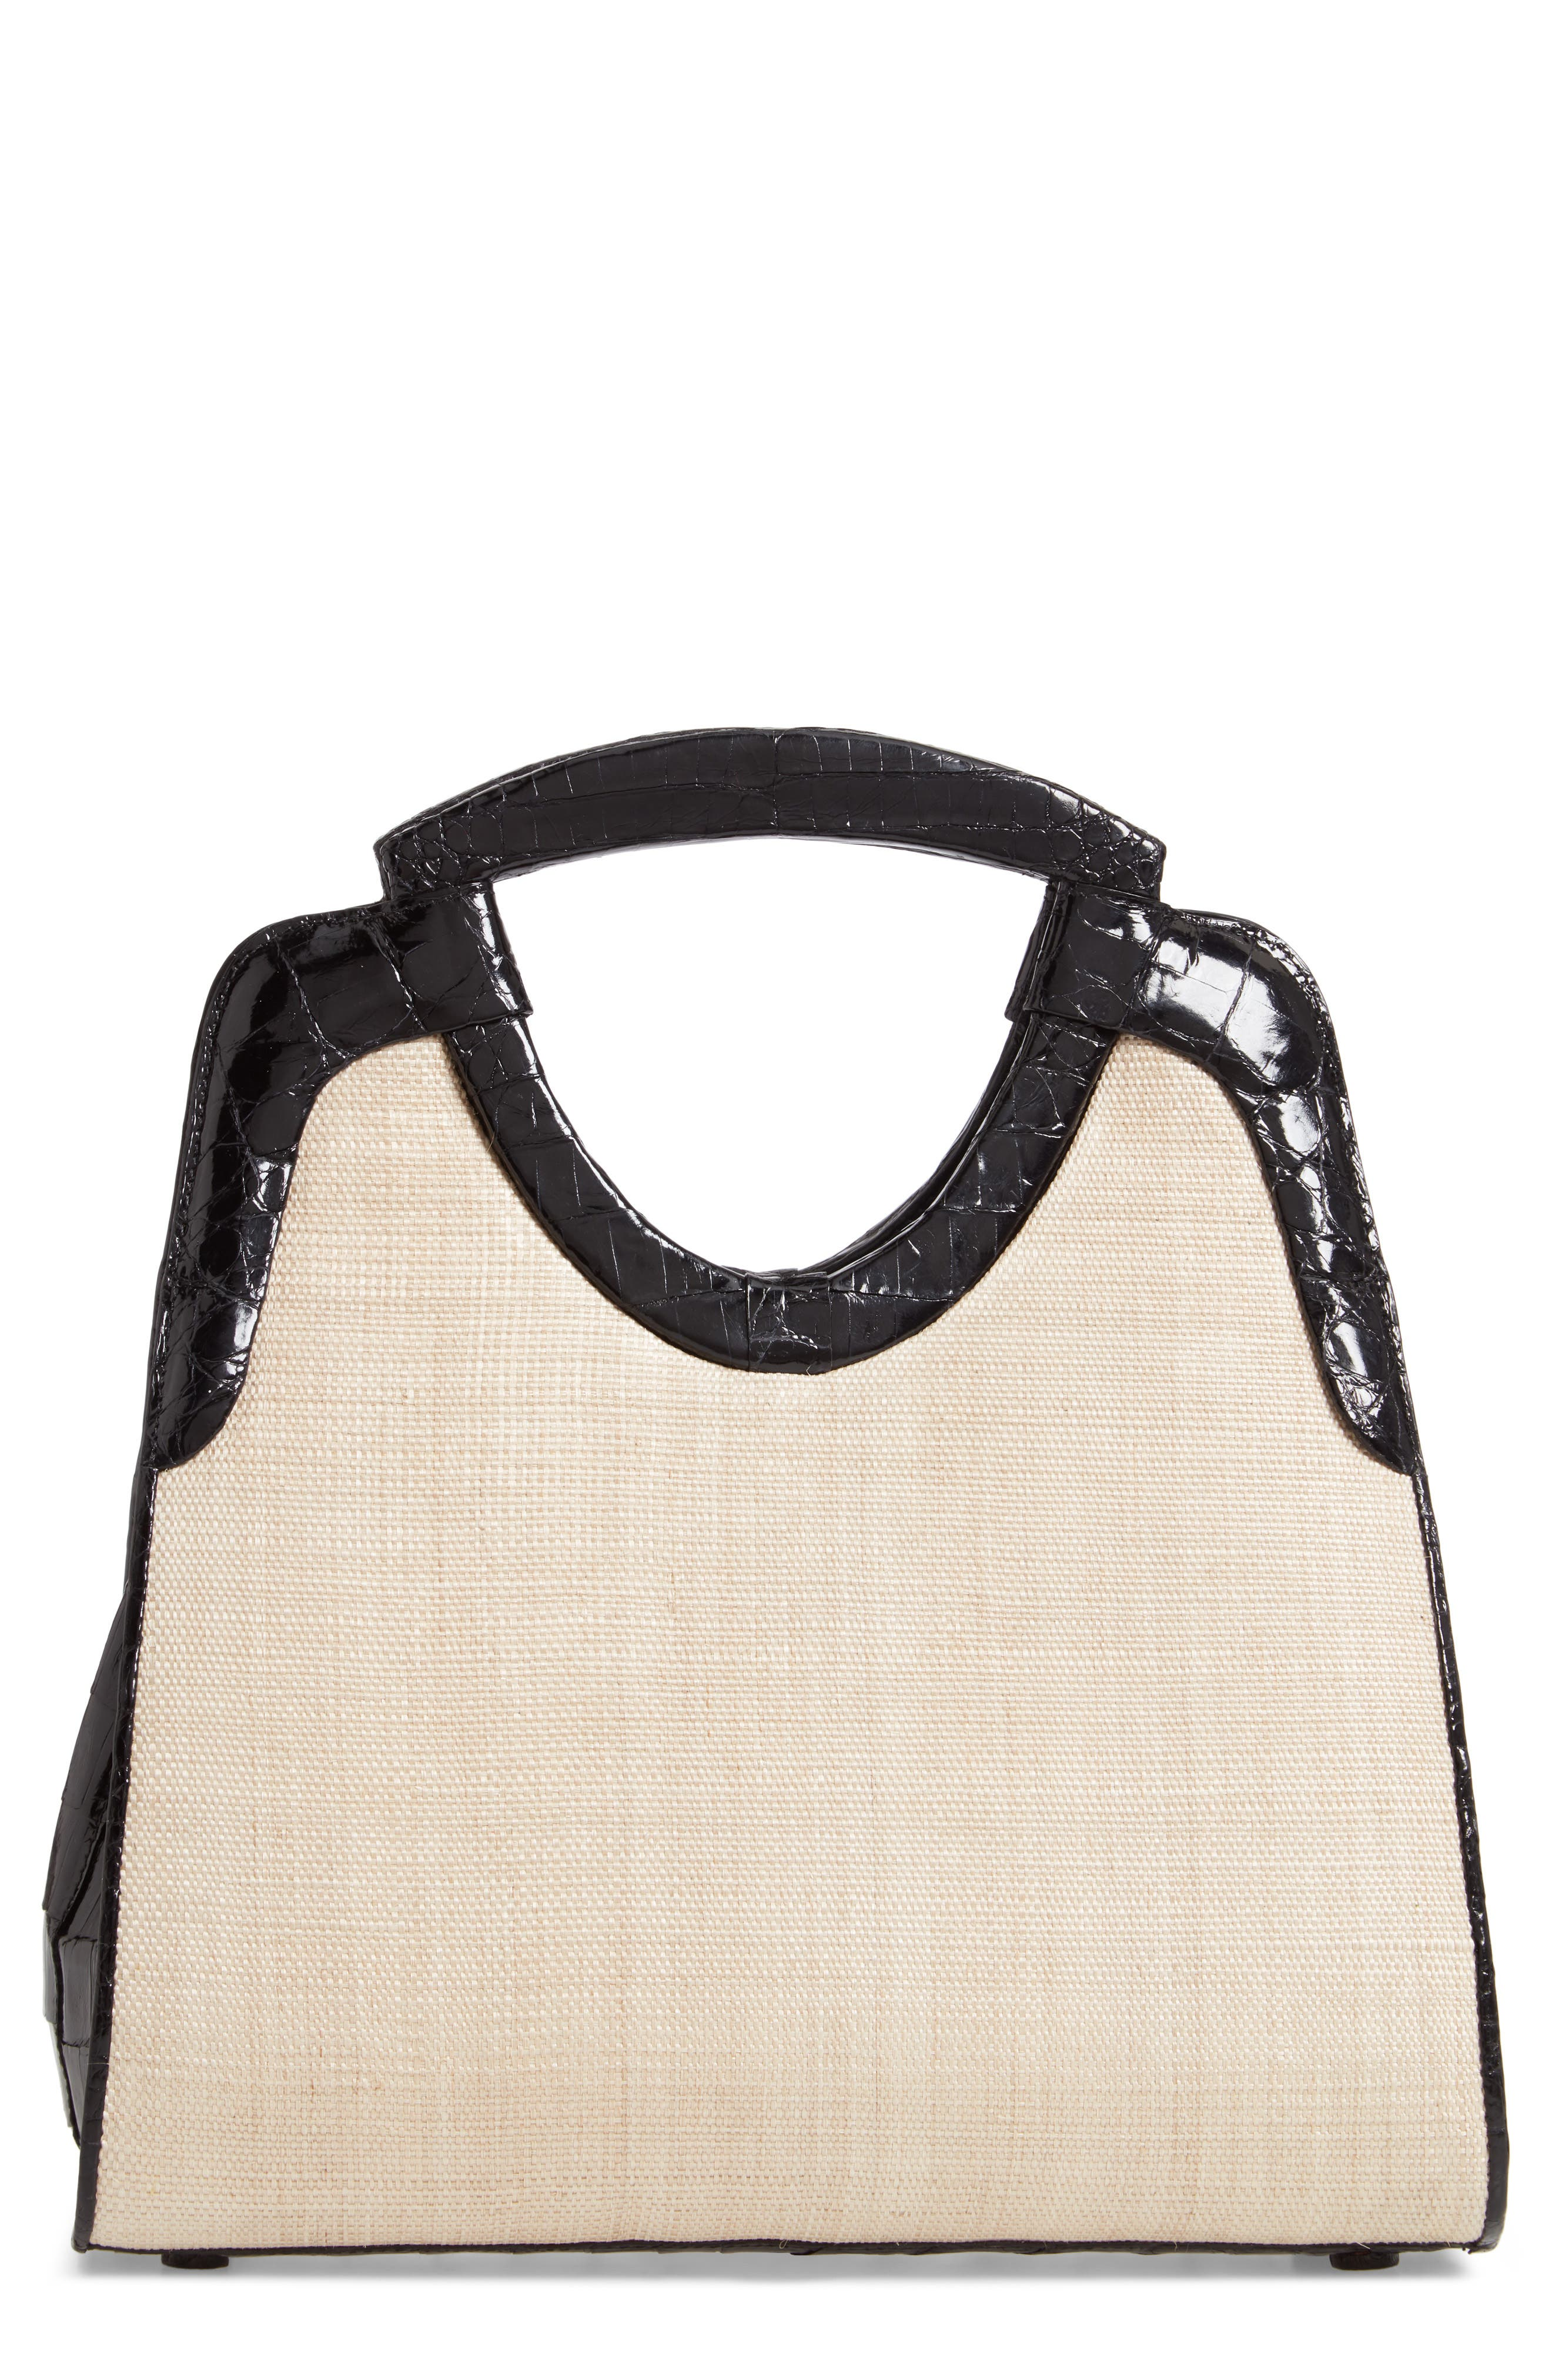 Small Genuine Crocodile Top Handle Bag,                             Main thumbnail 1, color,                             BLACK/ STRAW